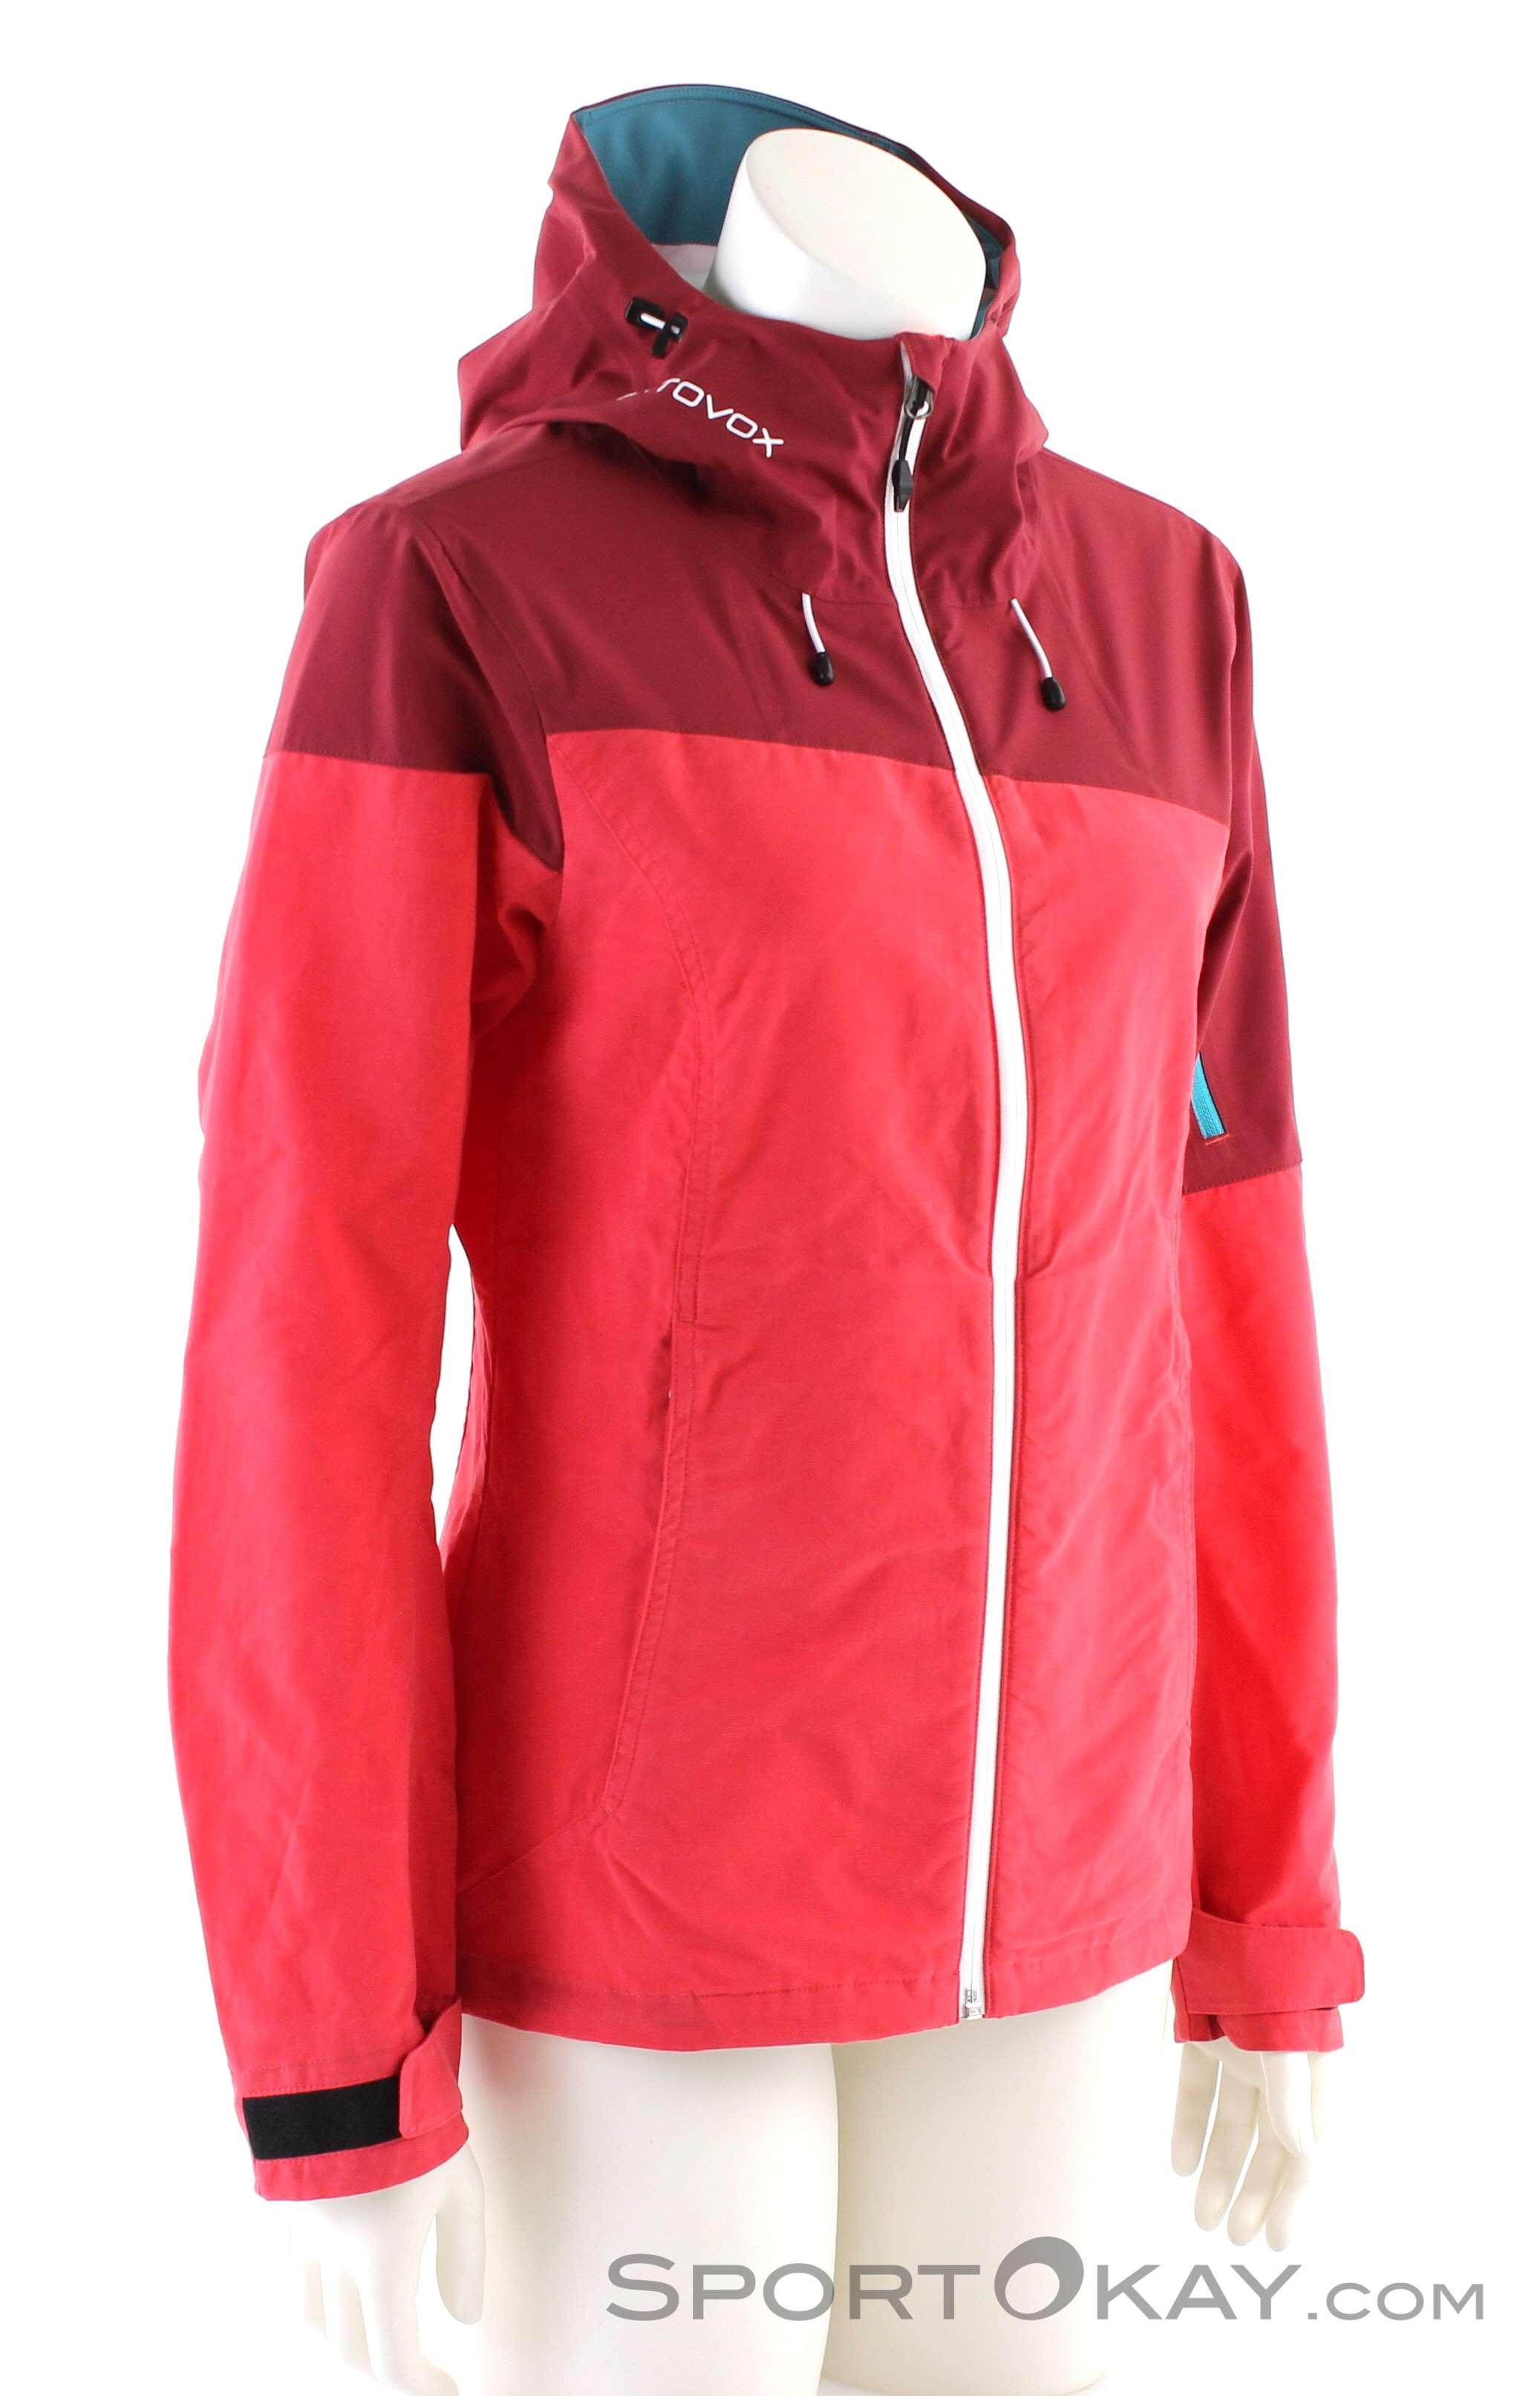 Ortovox Corvara Jacket Damen Outdoorjacke-Pink-Rosa-S